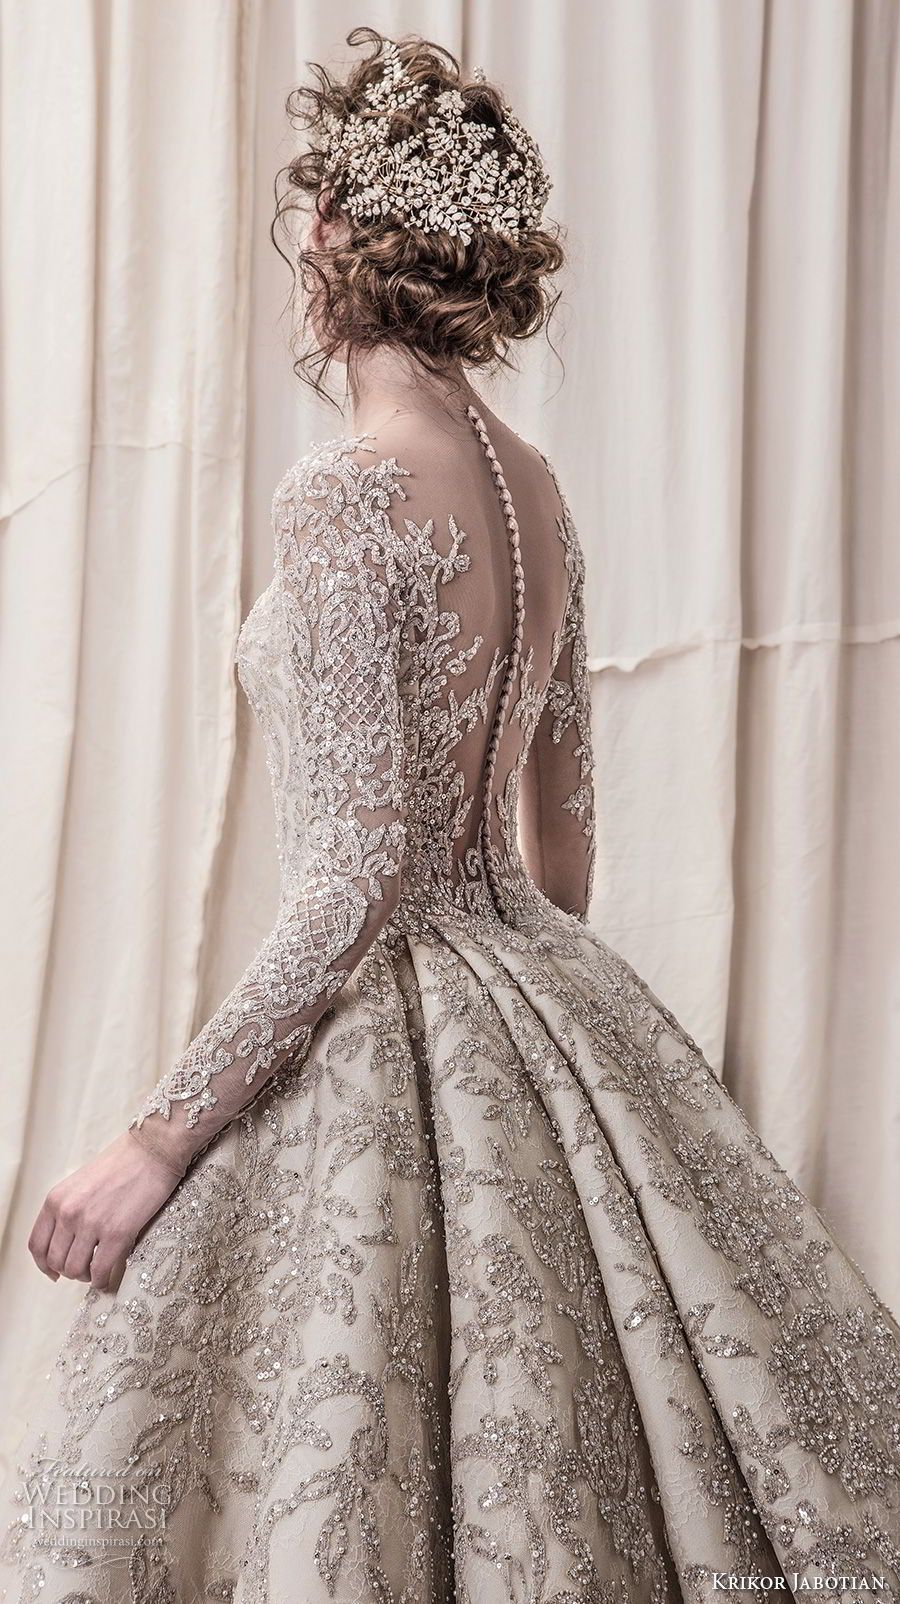 Krikor jabotian spring bridal long sleeves scoop neck full